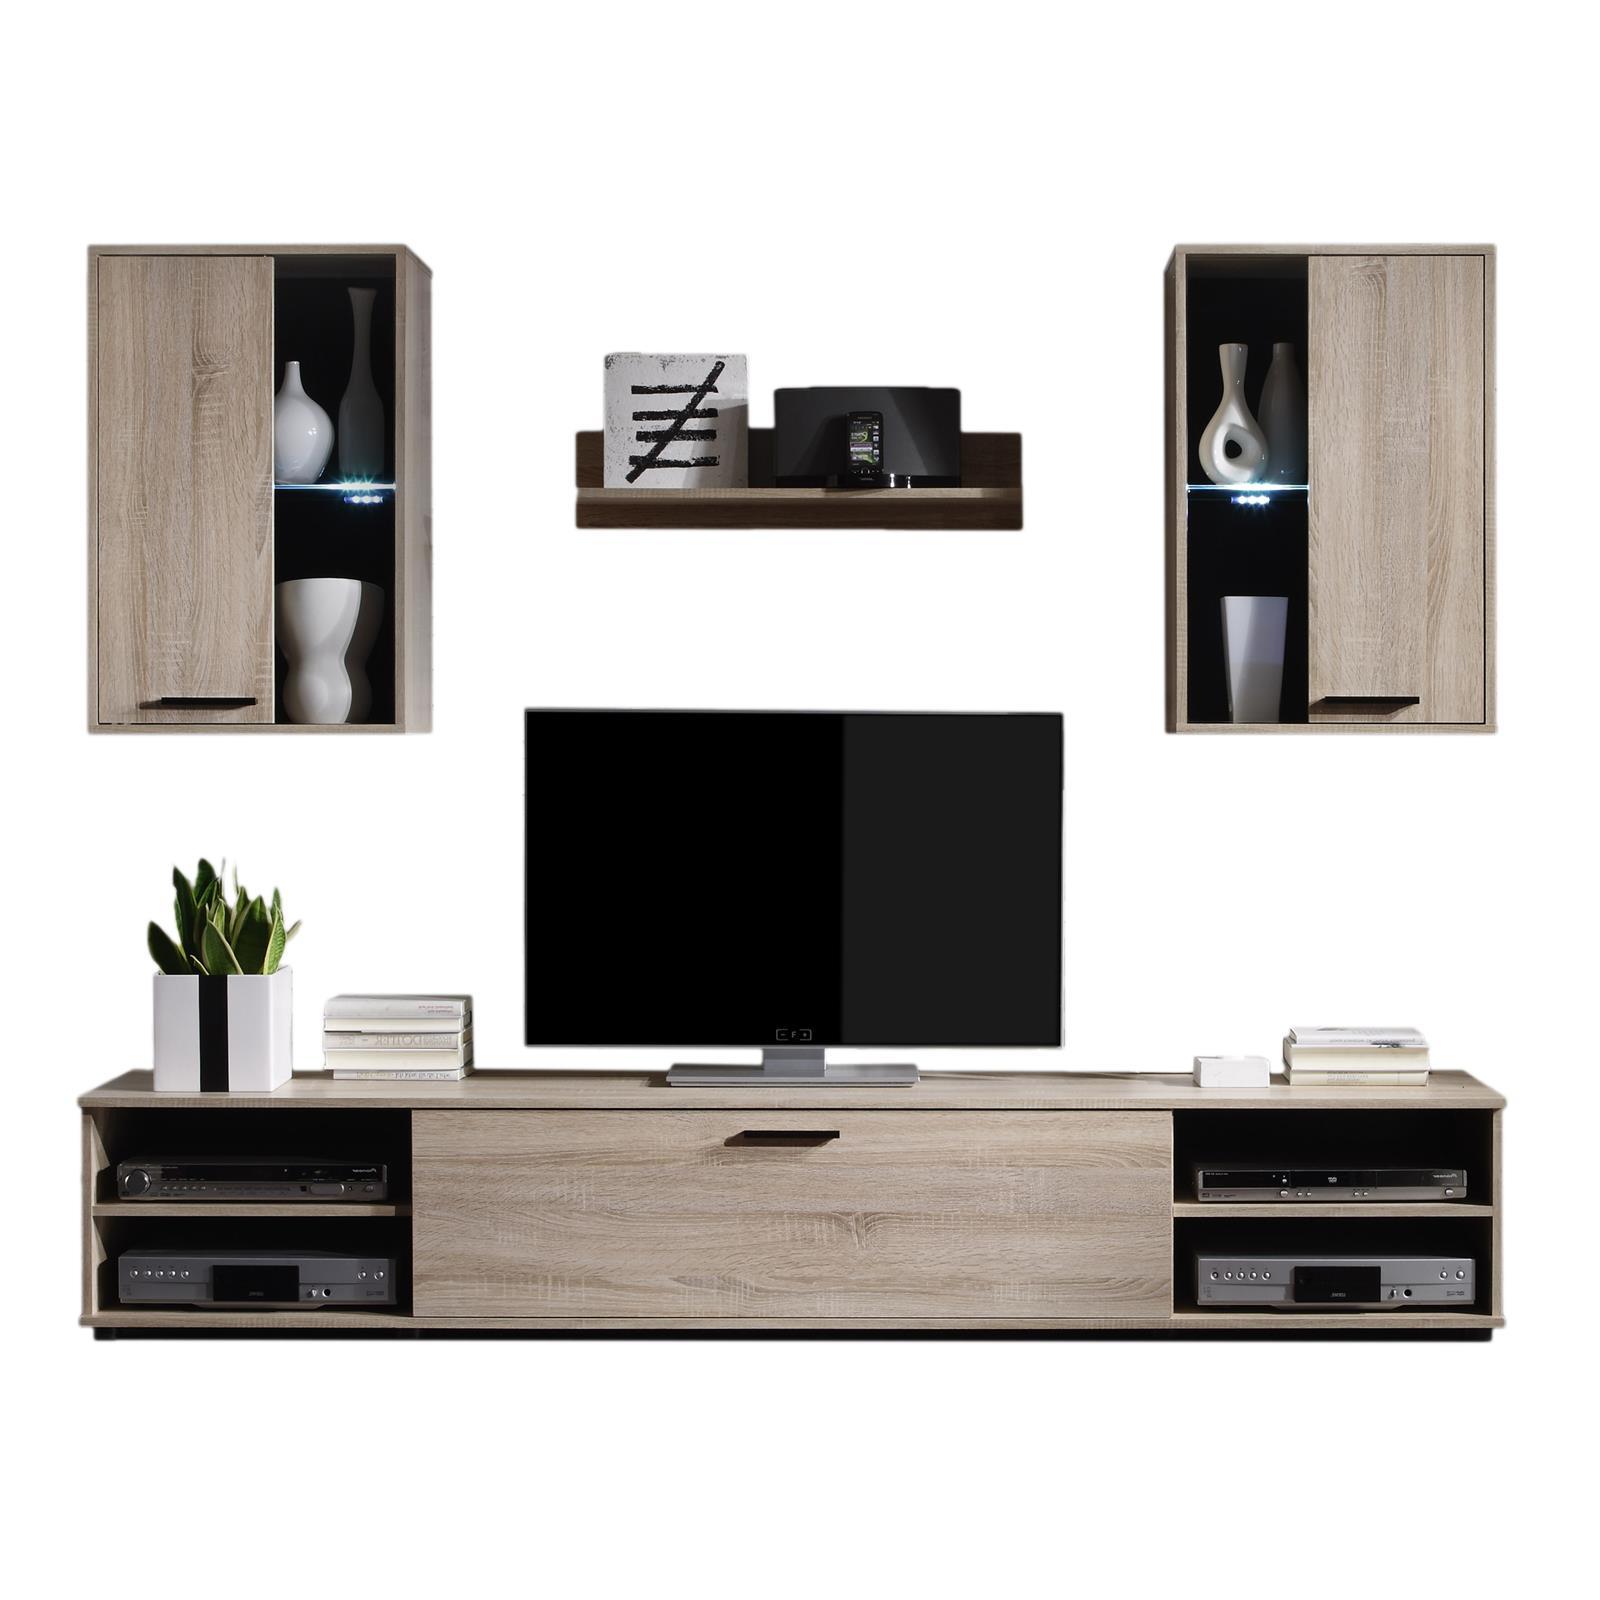 yarial = wohnwand boom kompakt led beleuchtung eiche, Gestaltungsideen